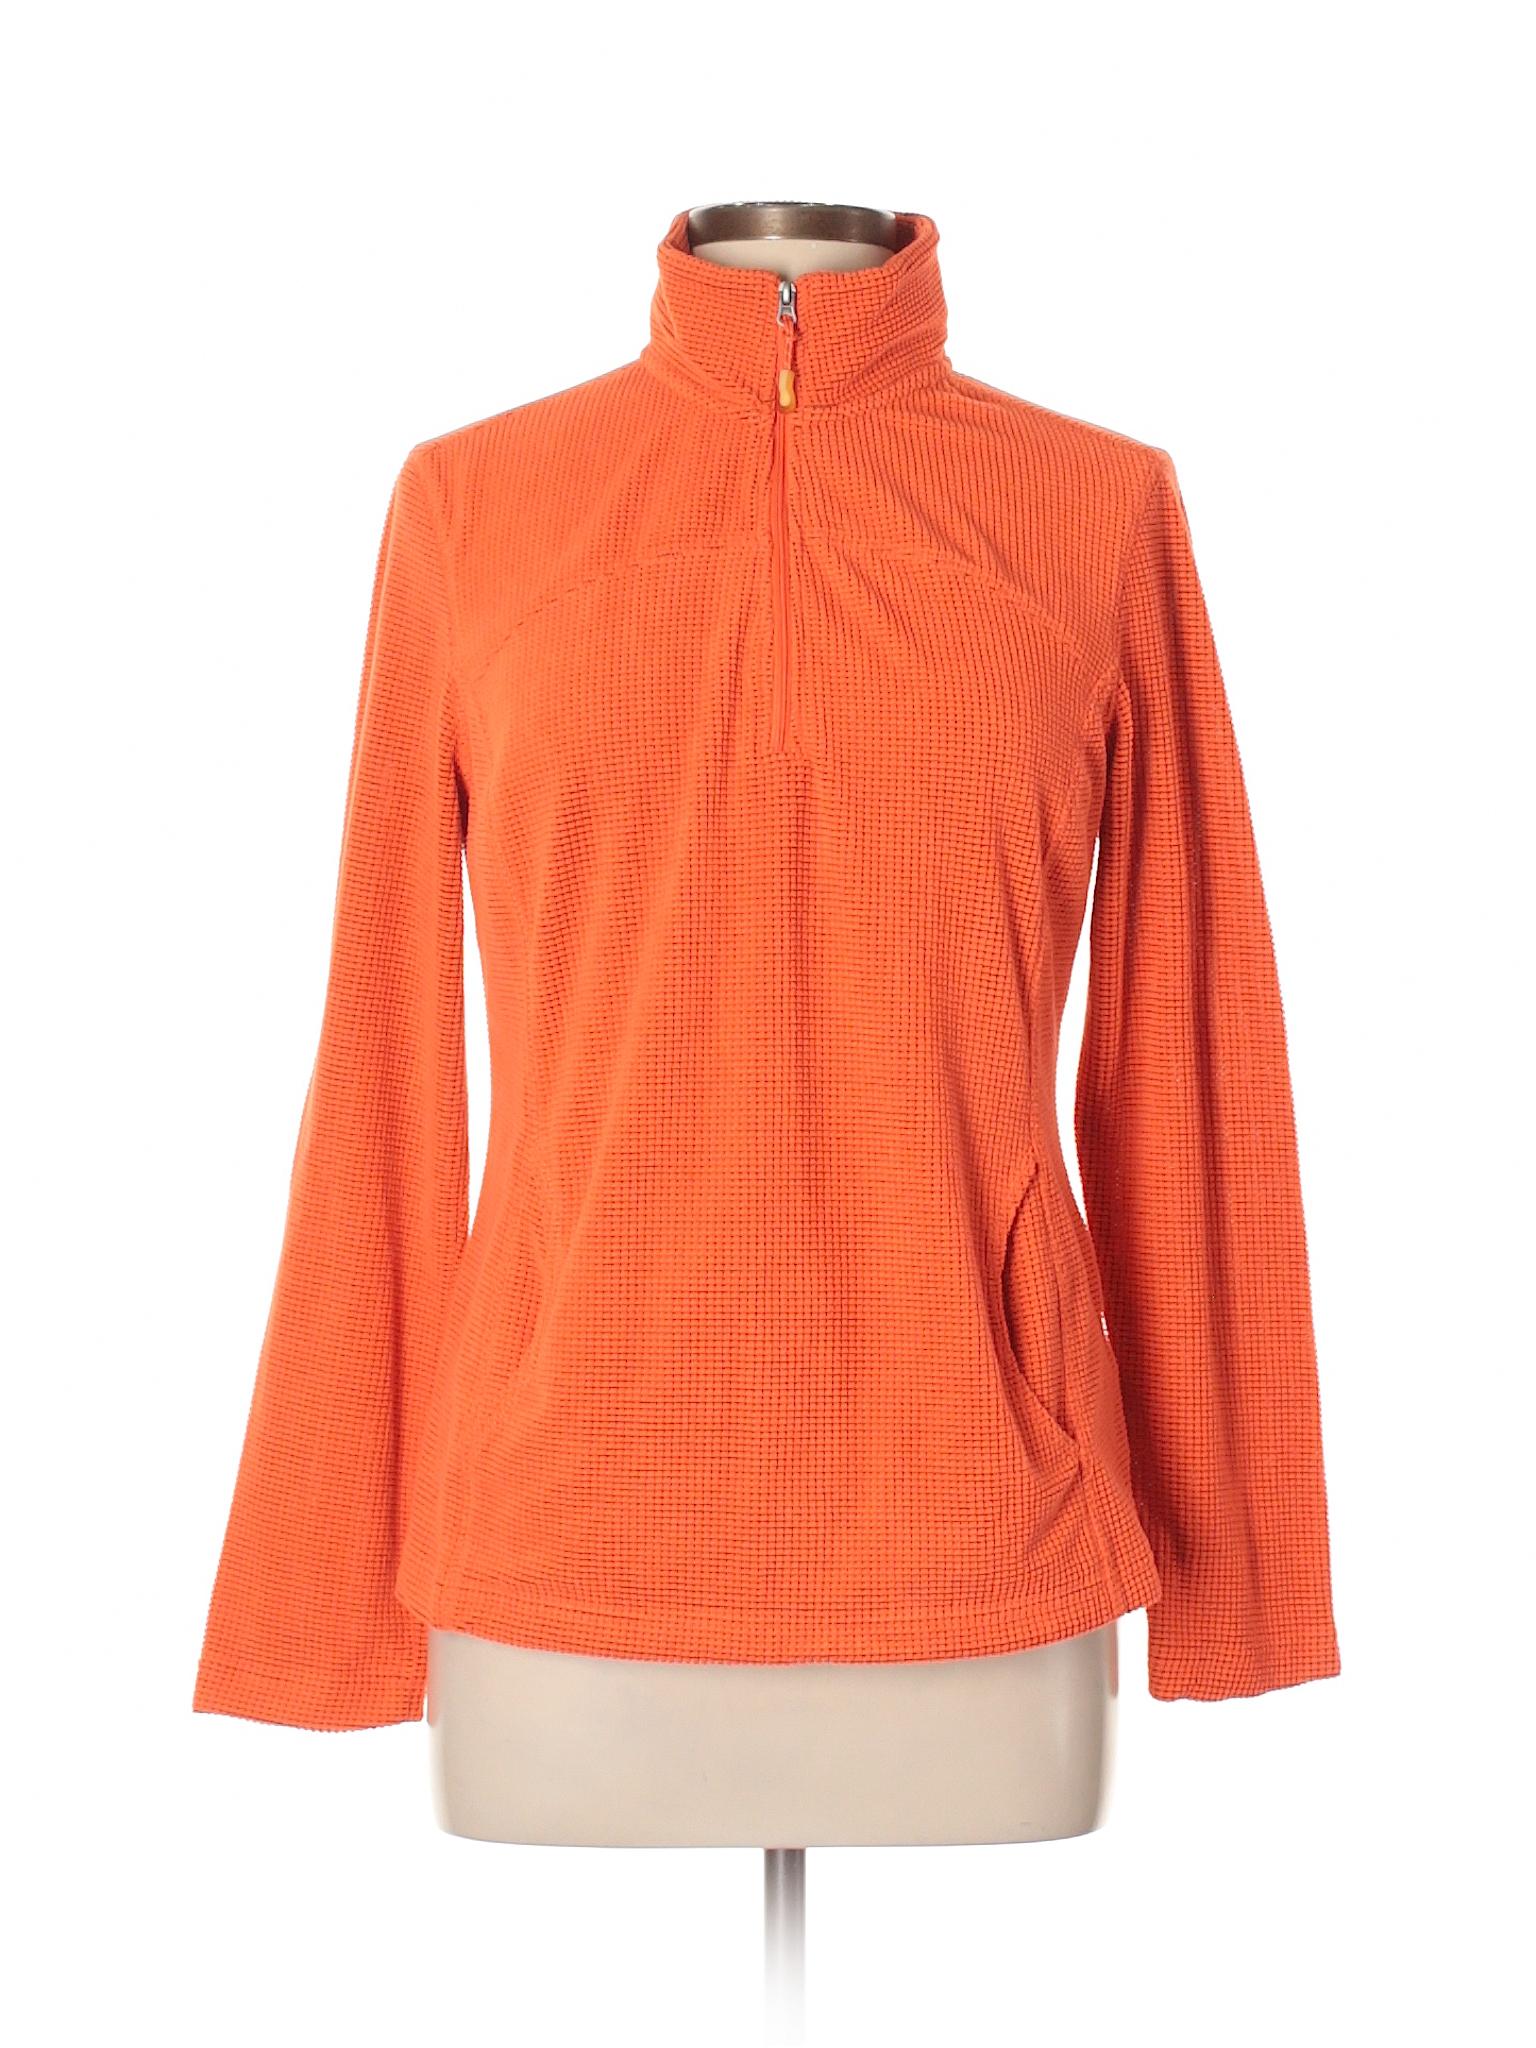 Leisure winter Leisure Track winter Jacket Tangerine 8n0xqfR